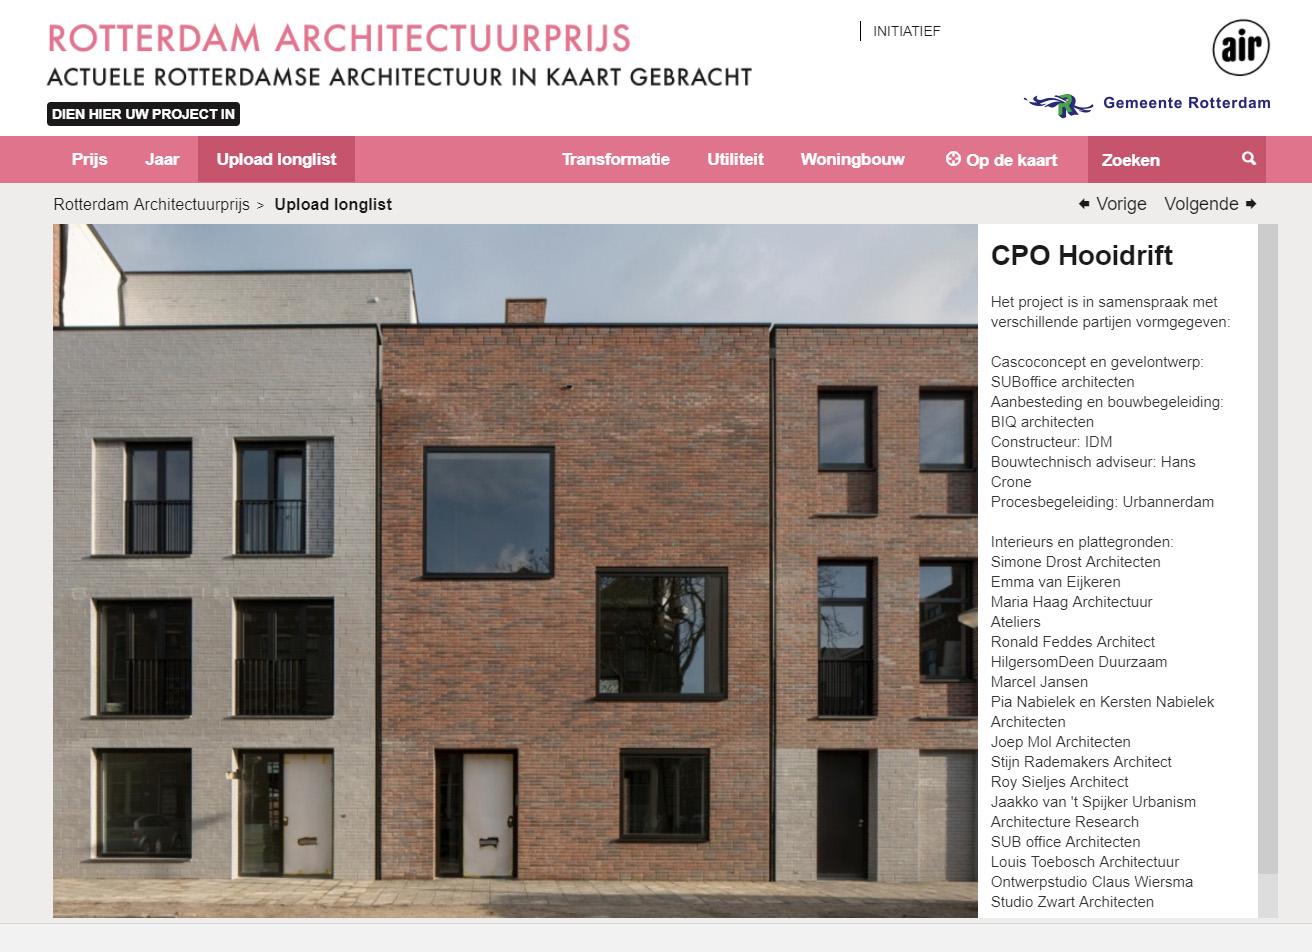 rotterdam architectuurprijs.jpg